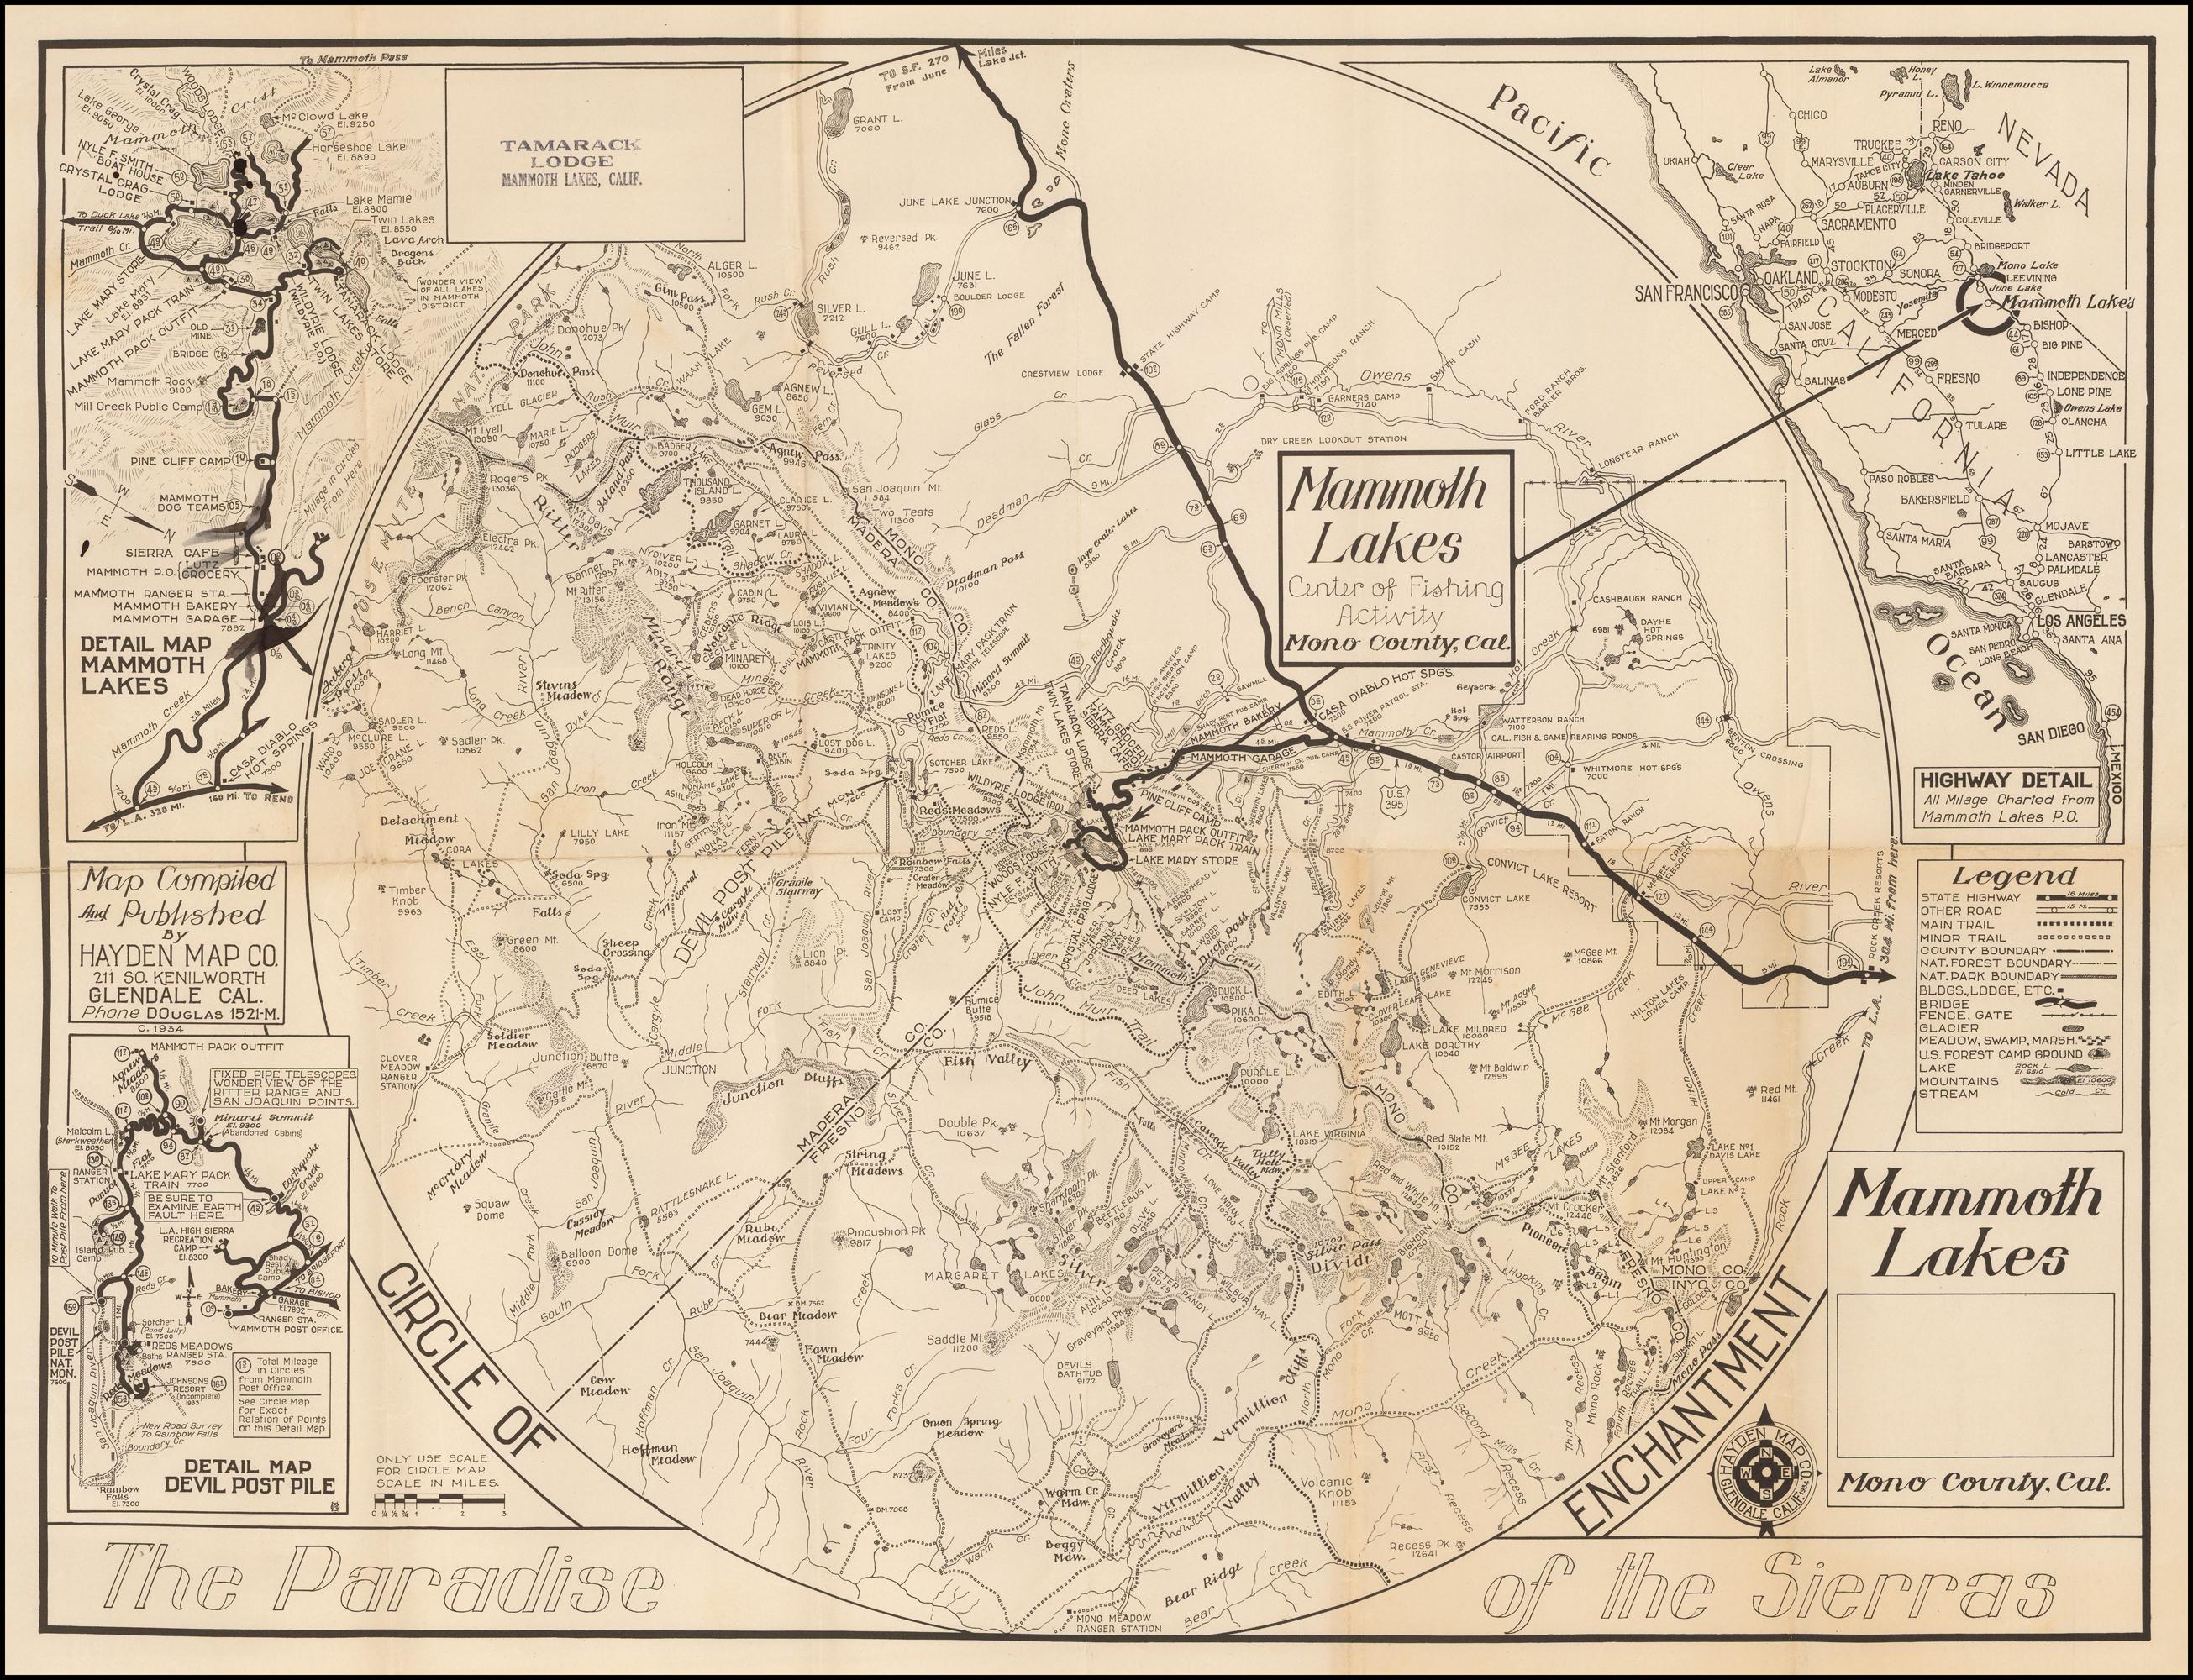 A Circle of Enchantment Mammoth Lakes, Mono County, Cal. The ... on big pine map, tempe lake map, hope ranch map, lake tahoe map, mono county map, riverbank map, pinon hills map, yosemite national park map, hayfork map, big bear map, mountain ranch map, california map, mt laguna map, fish camp map, june lake map, mammoth mountain map, laguna village map, gavilan hills map, mammoth village map, trinidad state beach map,